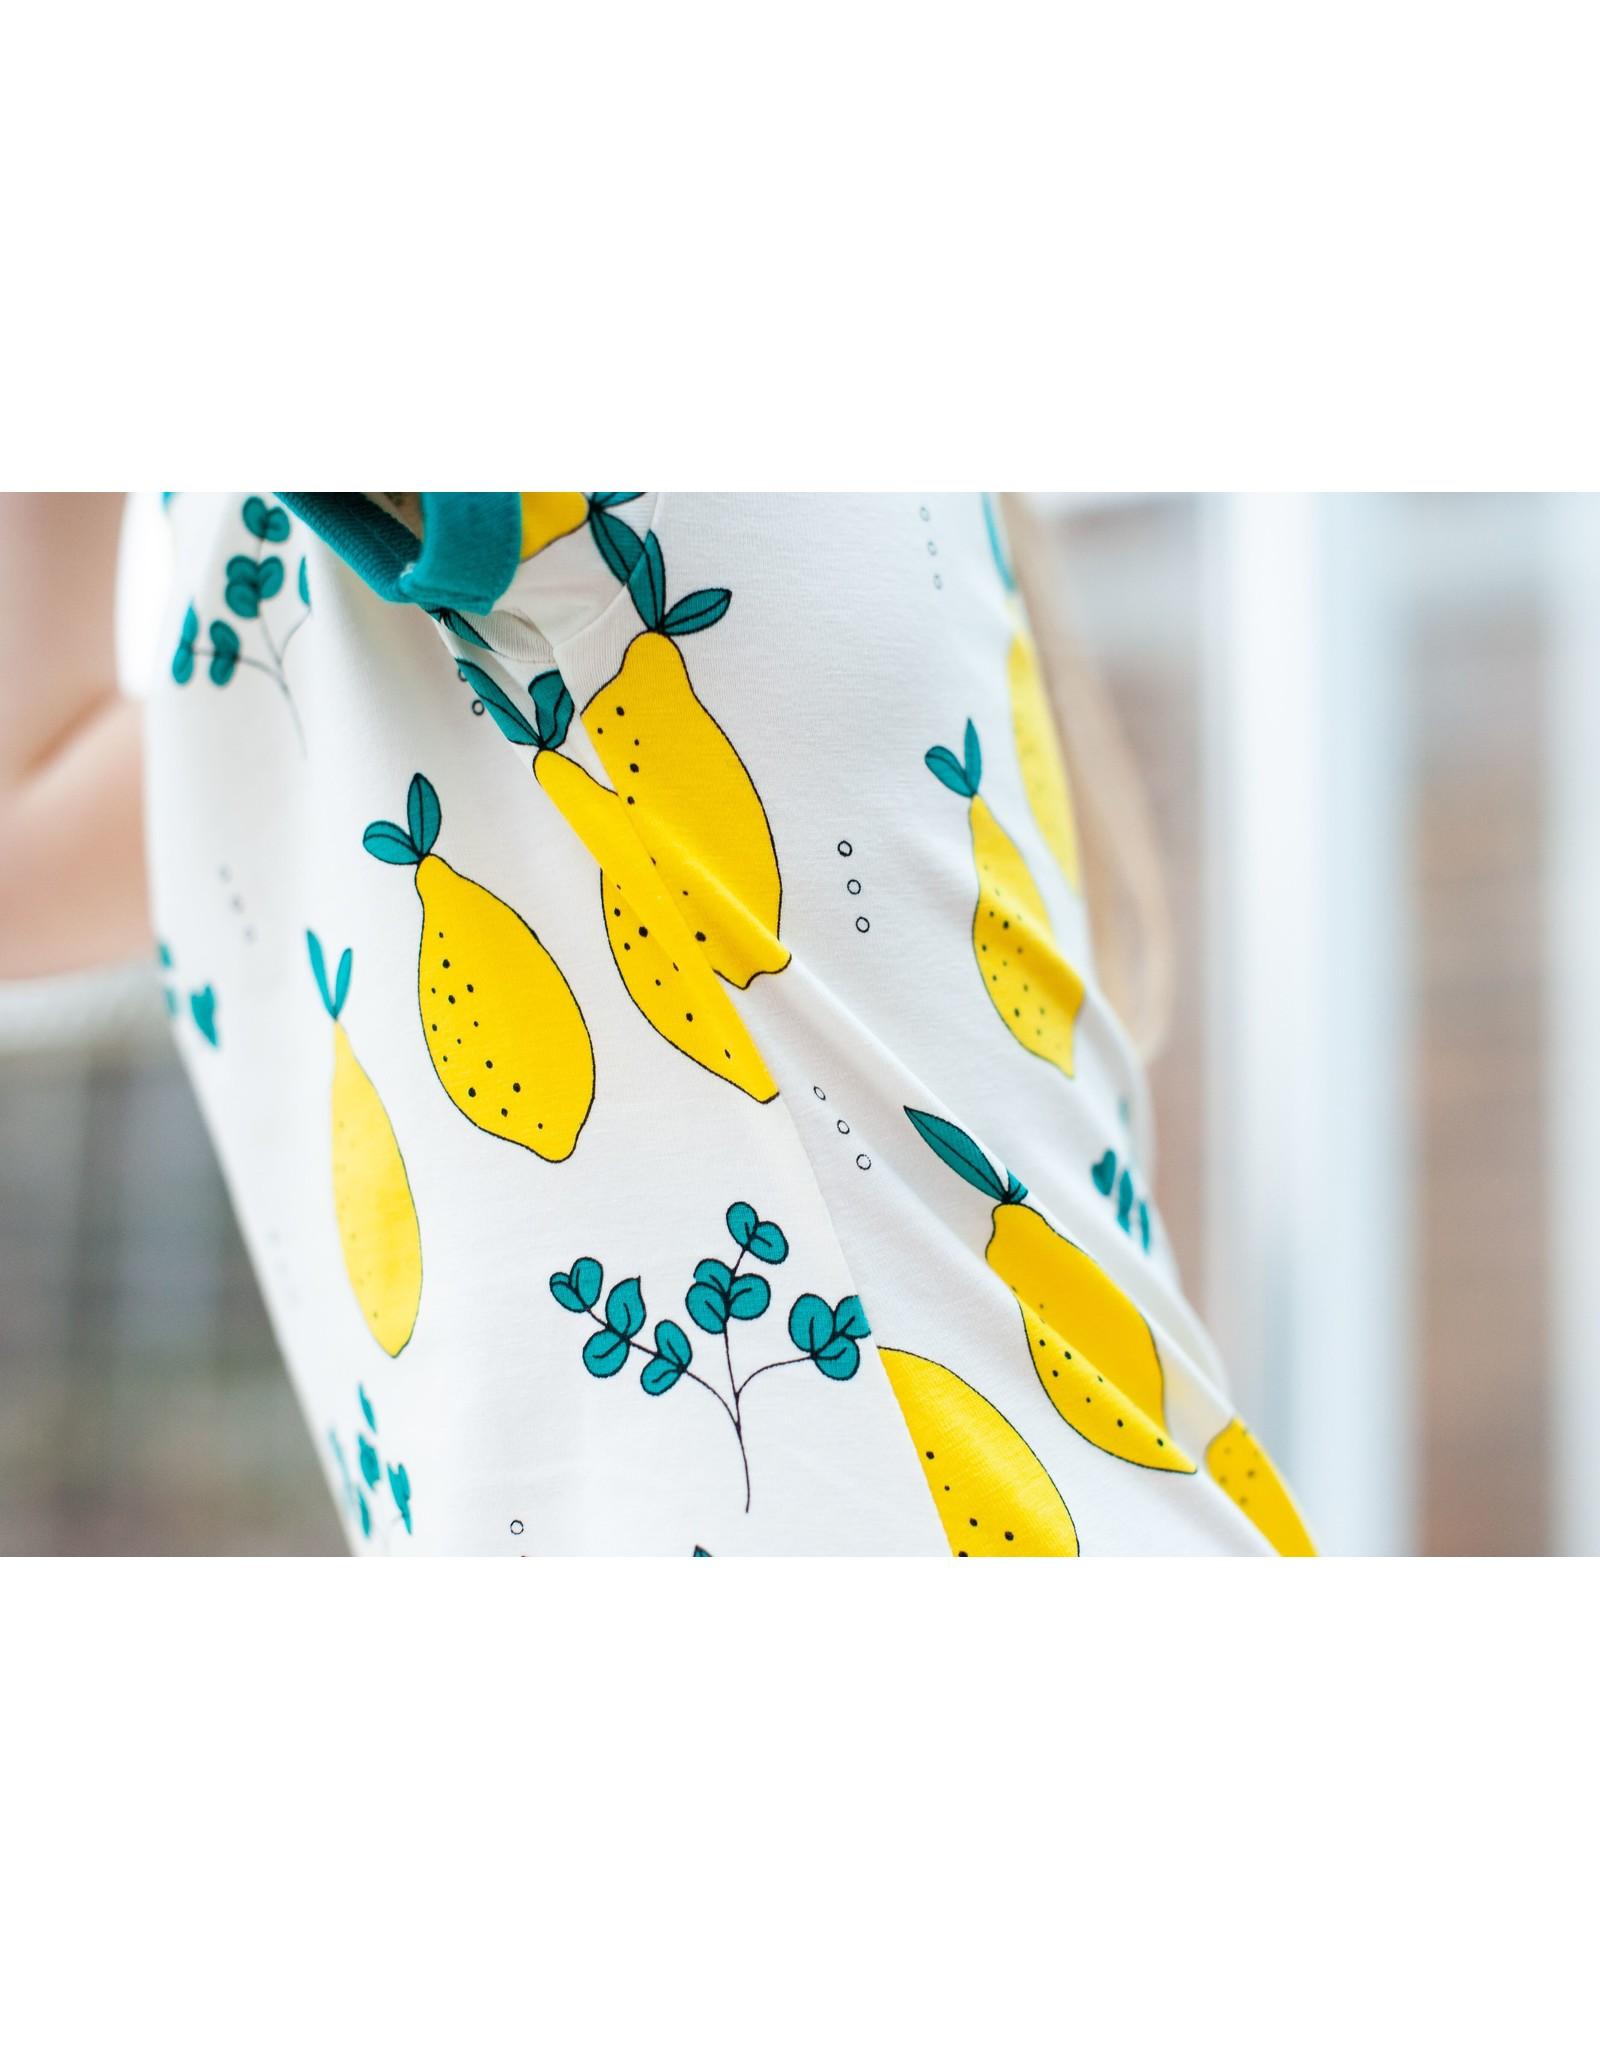 Meyadey Wit Meyadey kleedje met citroenen print